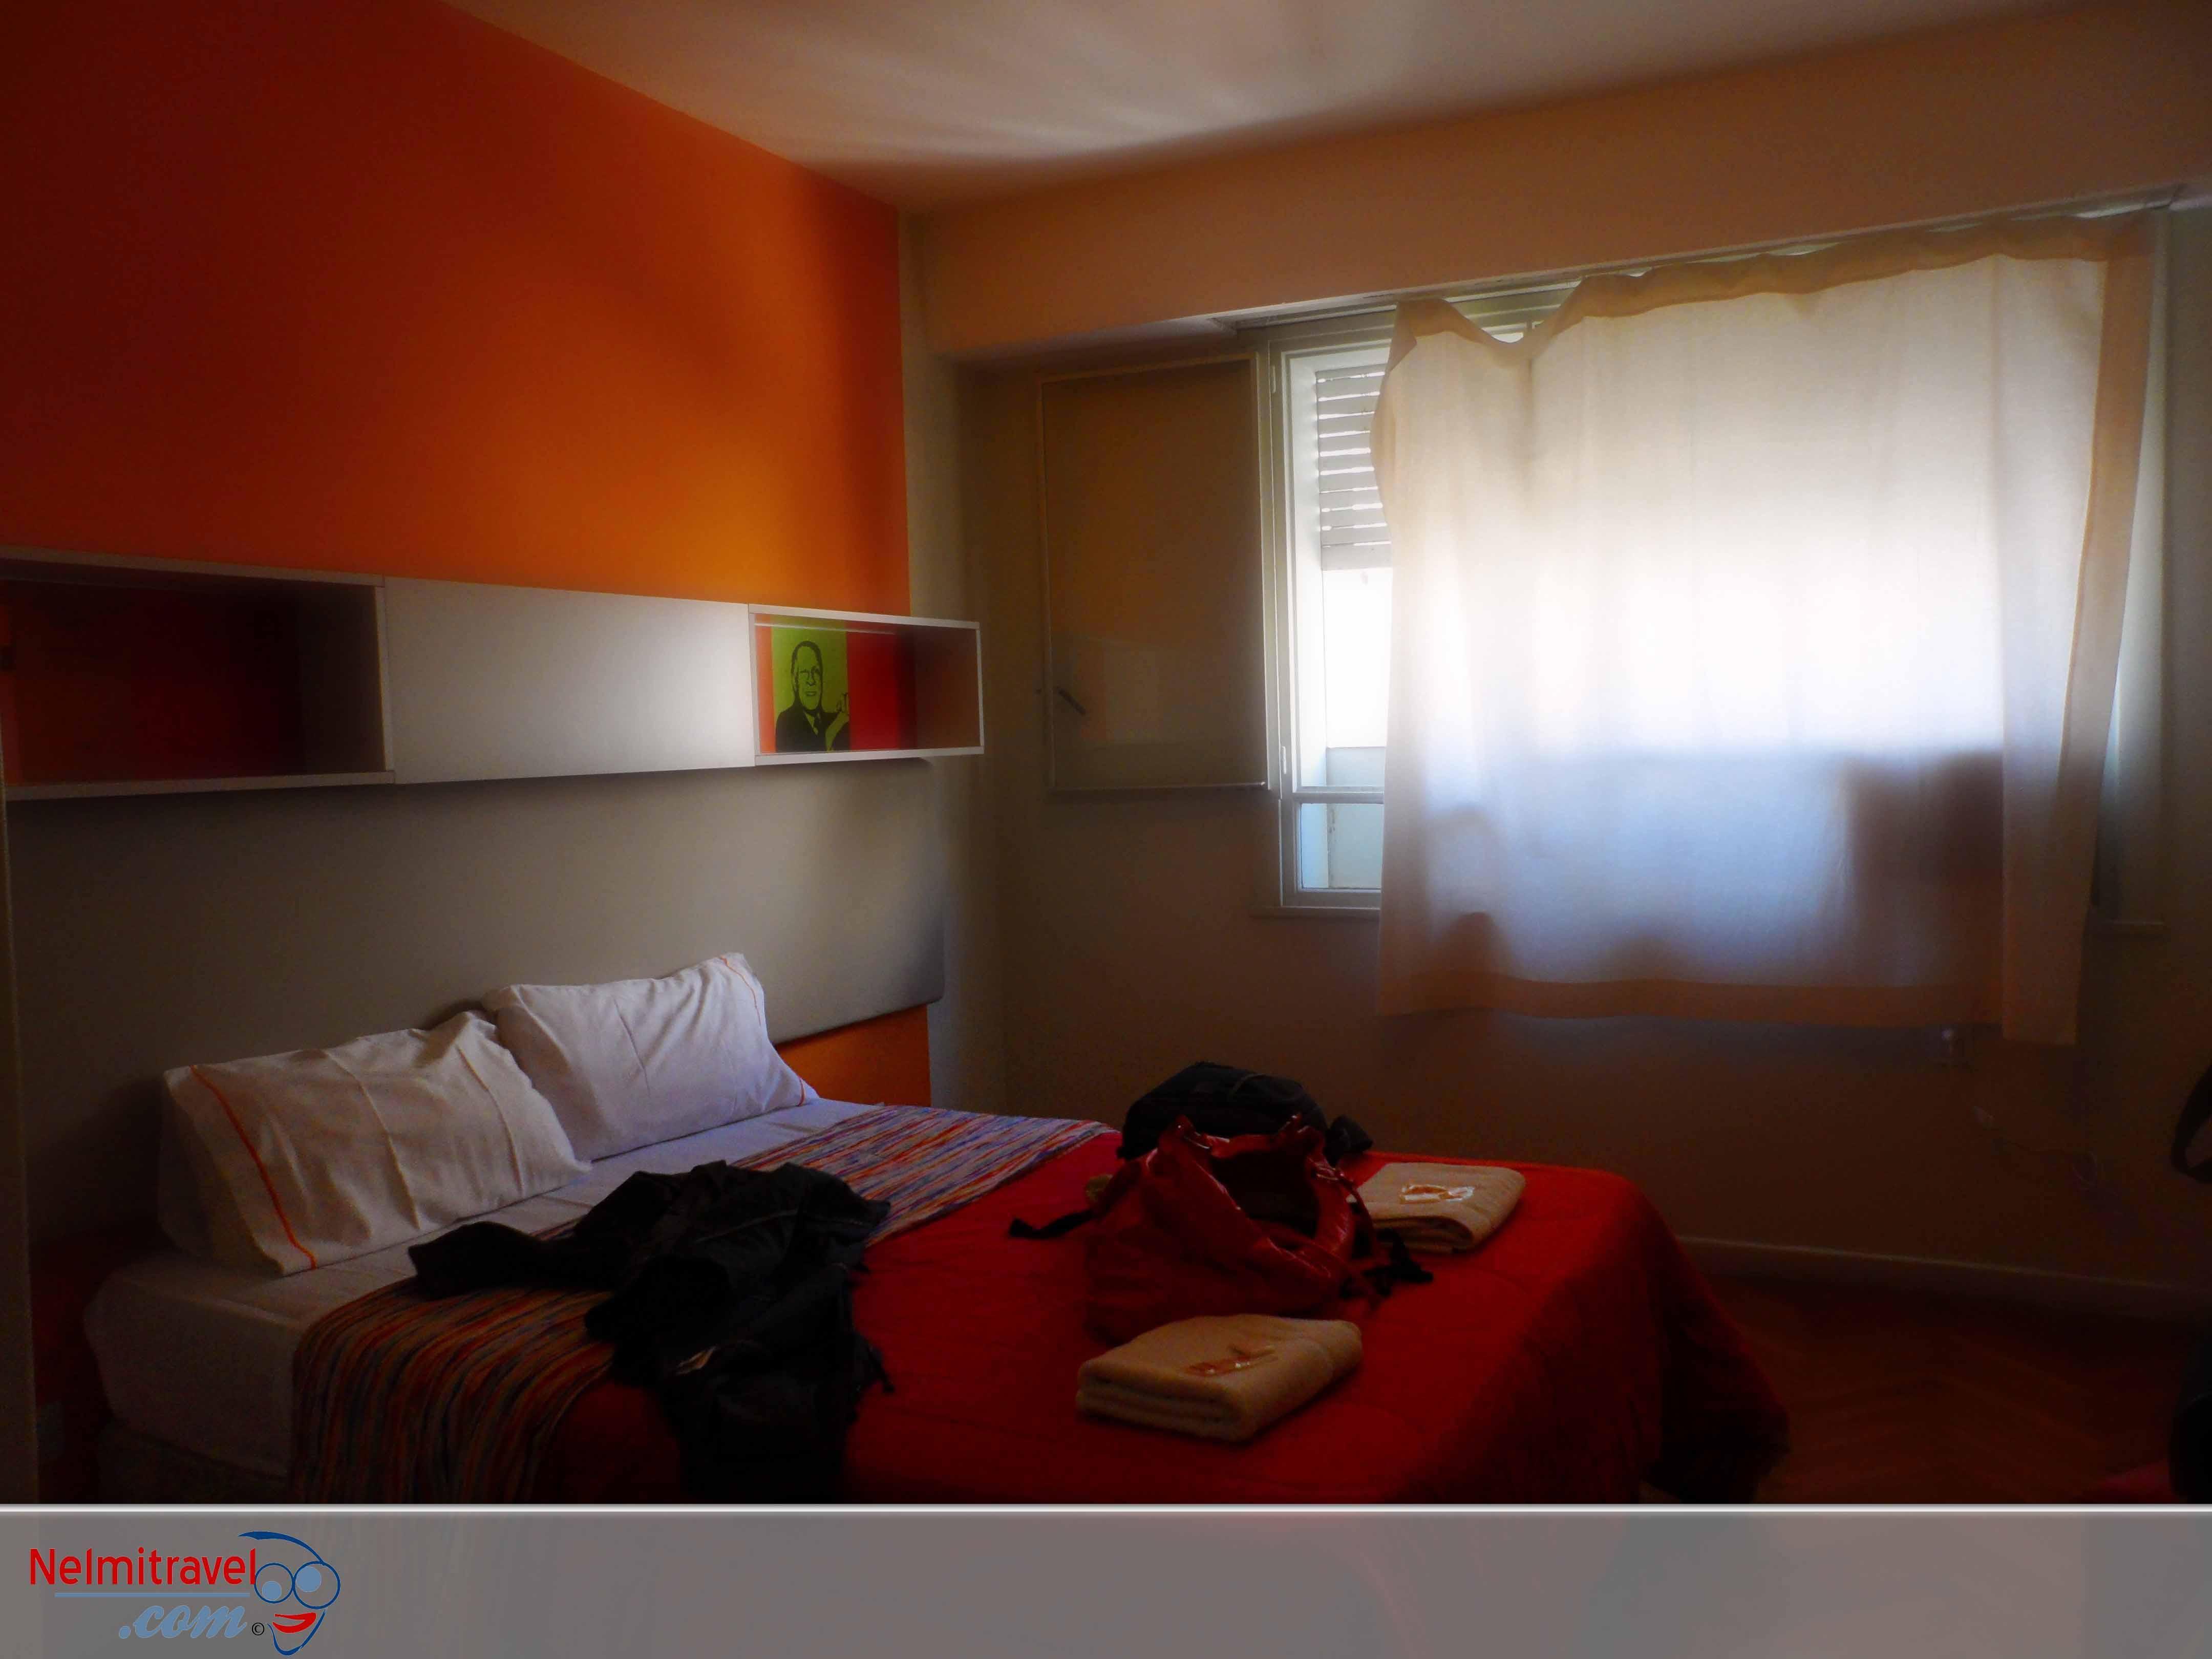 Hostel Suites Florida Buenos Aires,Hostel Suites Florida,Buenos Aires Turismo,Hostels in Buenos Aires